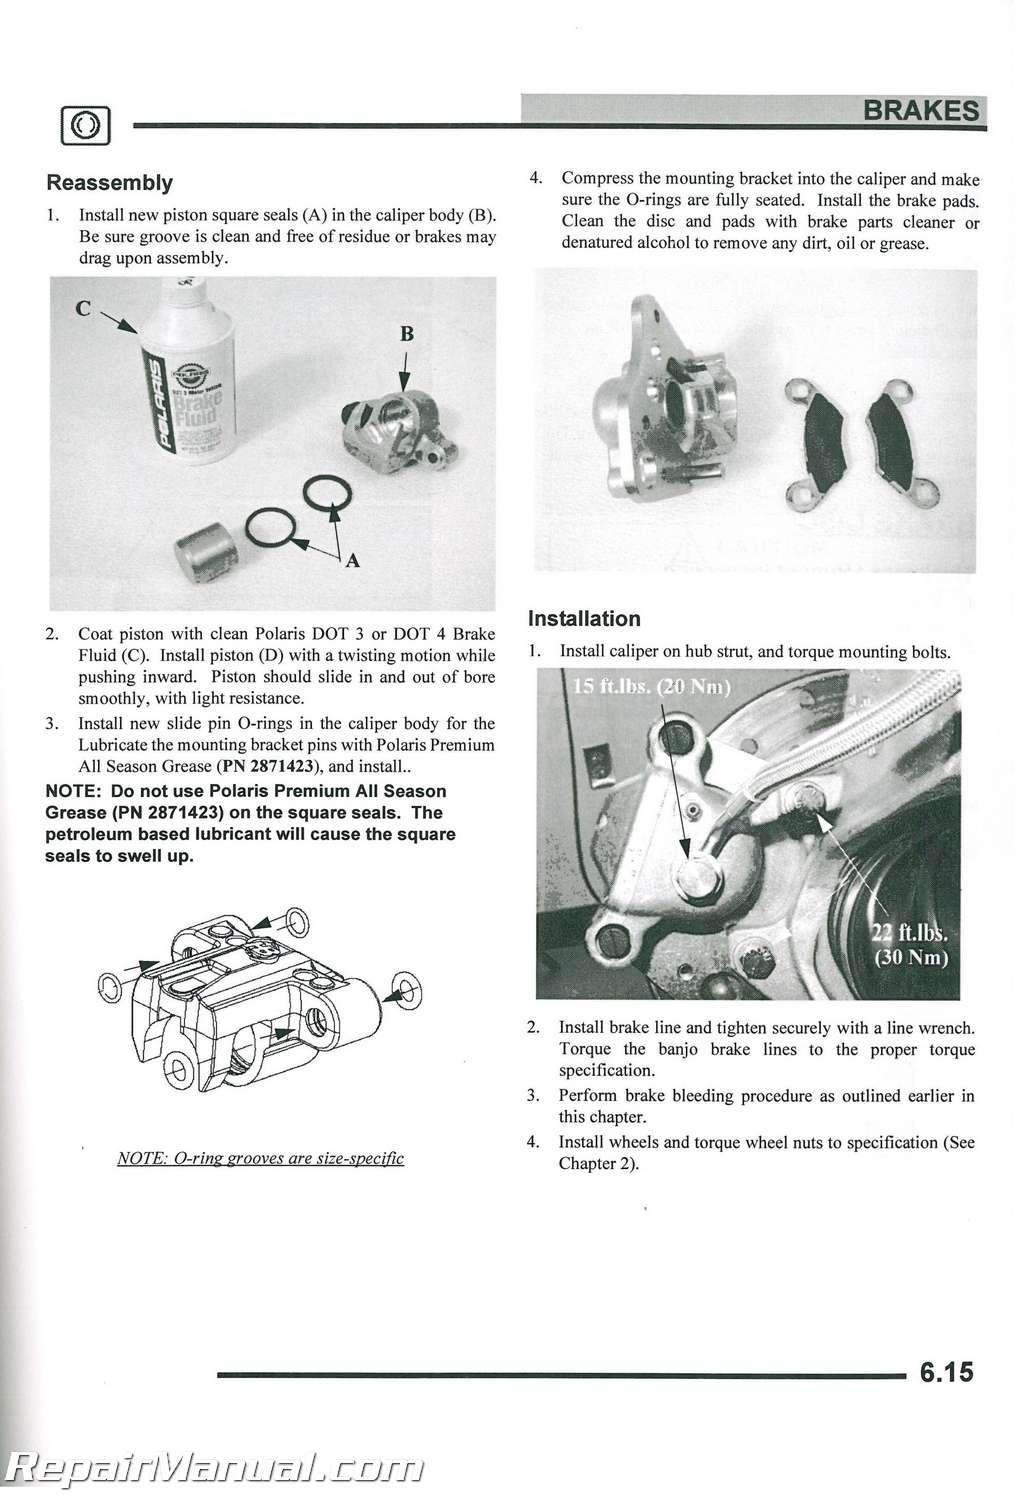 2006 polaris hawkeye 300 atv service repair manual rh repairmanual com 2006 Polaris Hawkeye 4x4 2006 polaris hawkeye service manual pdf